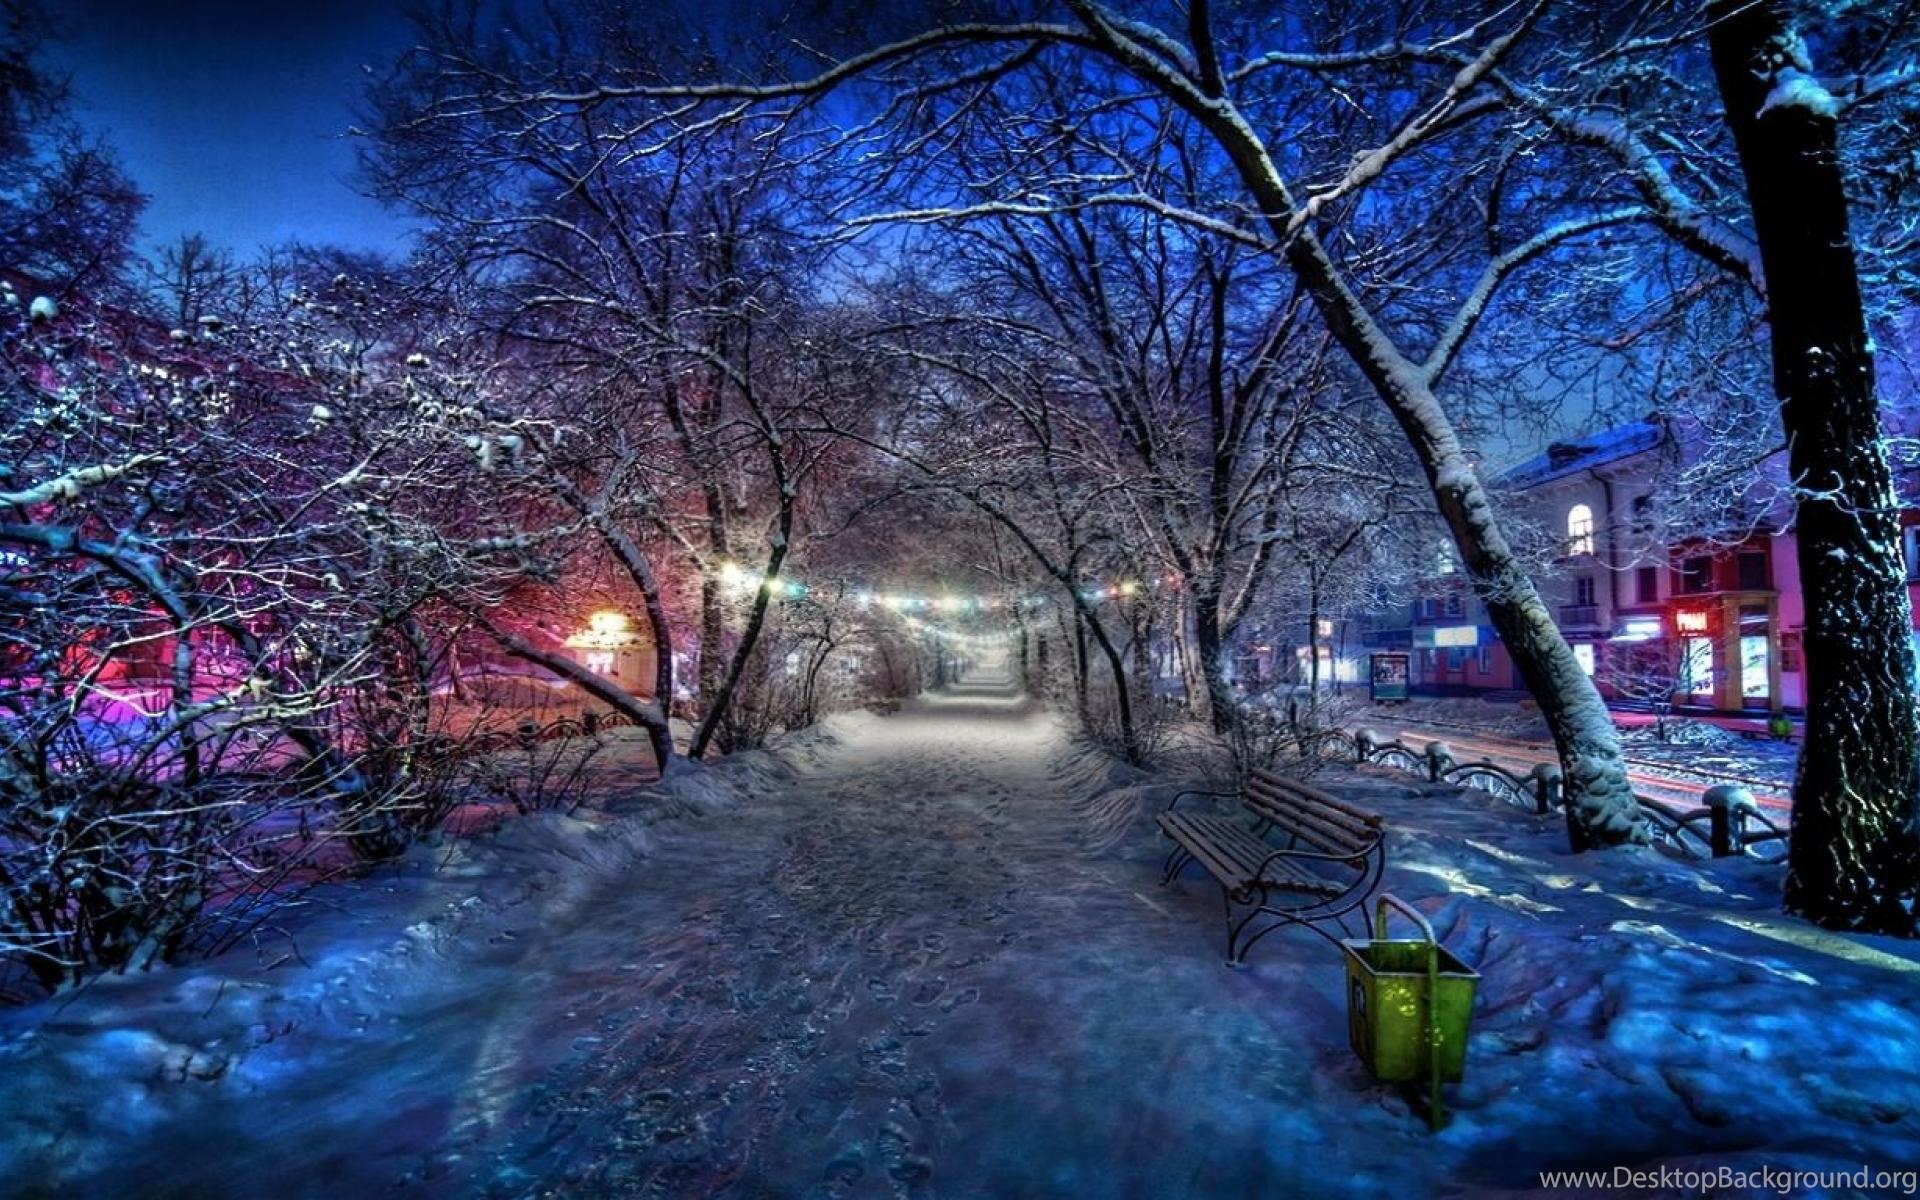 картинки на рабочий стол ночная зима карта фото космоса